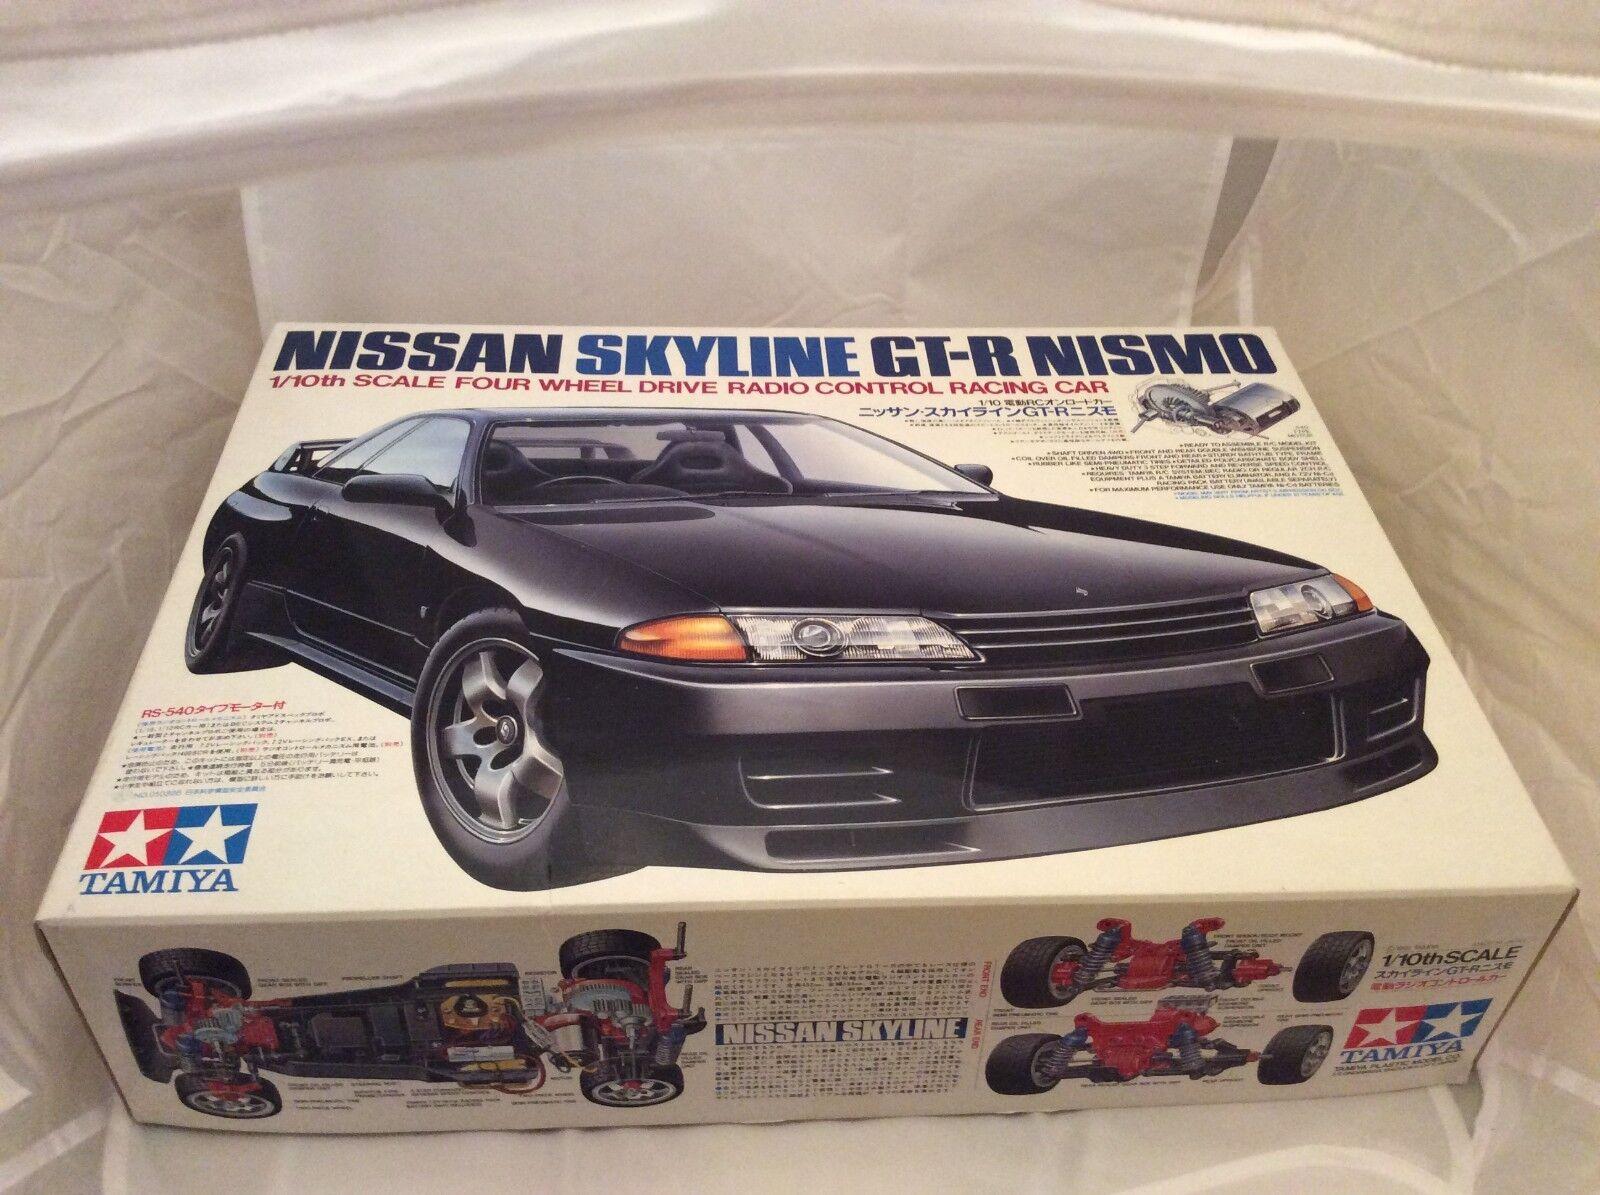 Tamiya Nissan Skyline GT-R NISMO 58099 Nuovo con Scatola 1991 RARA TA01 Nuovo in Scatola TA02